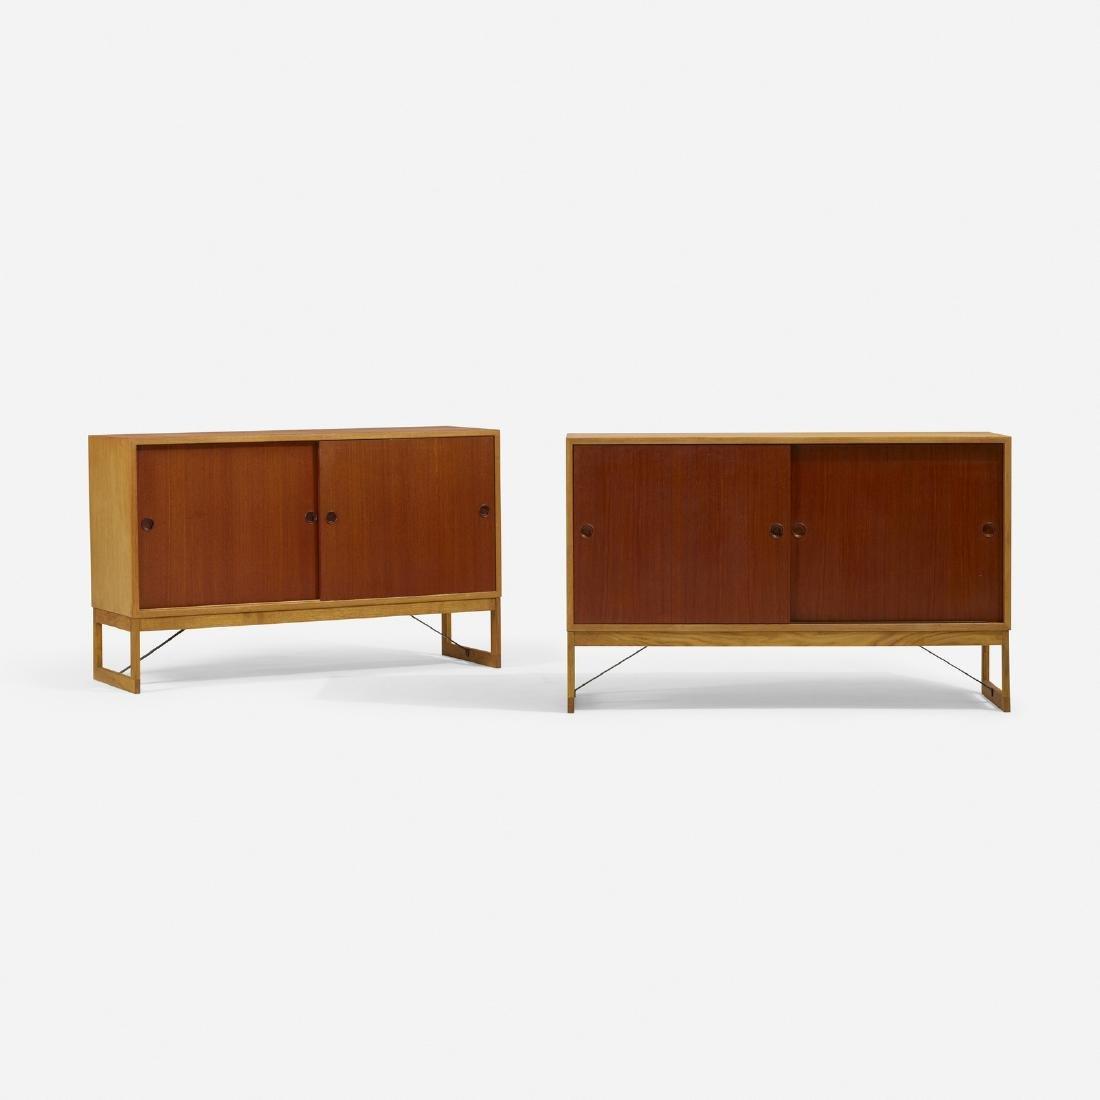 Borge Mogensen, cabinets, pair - 2